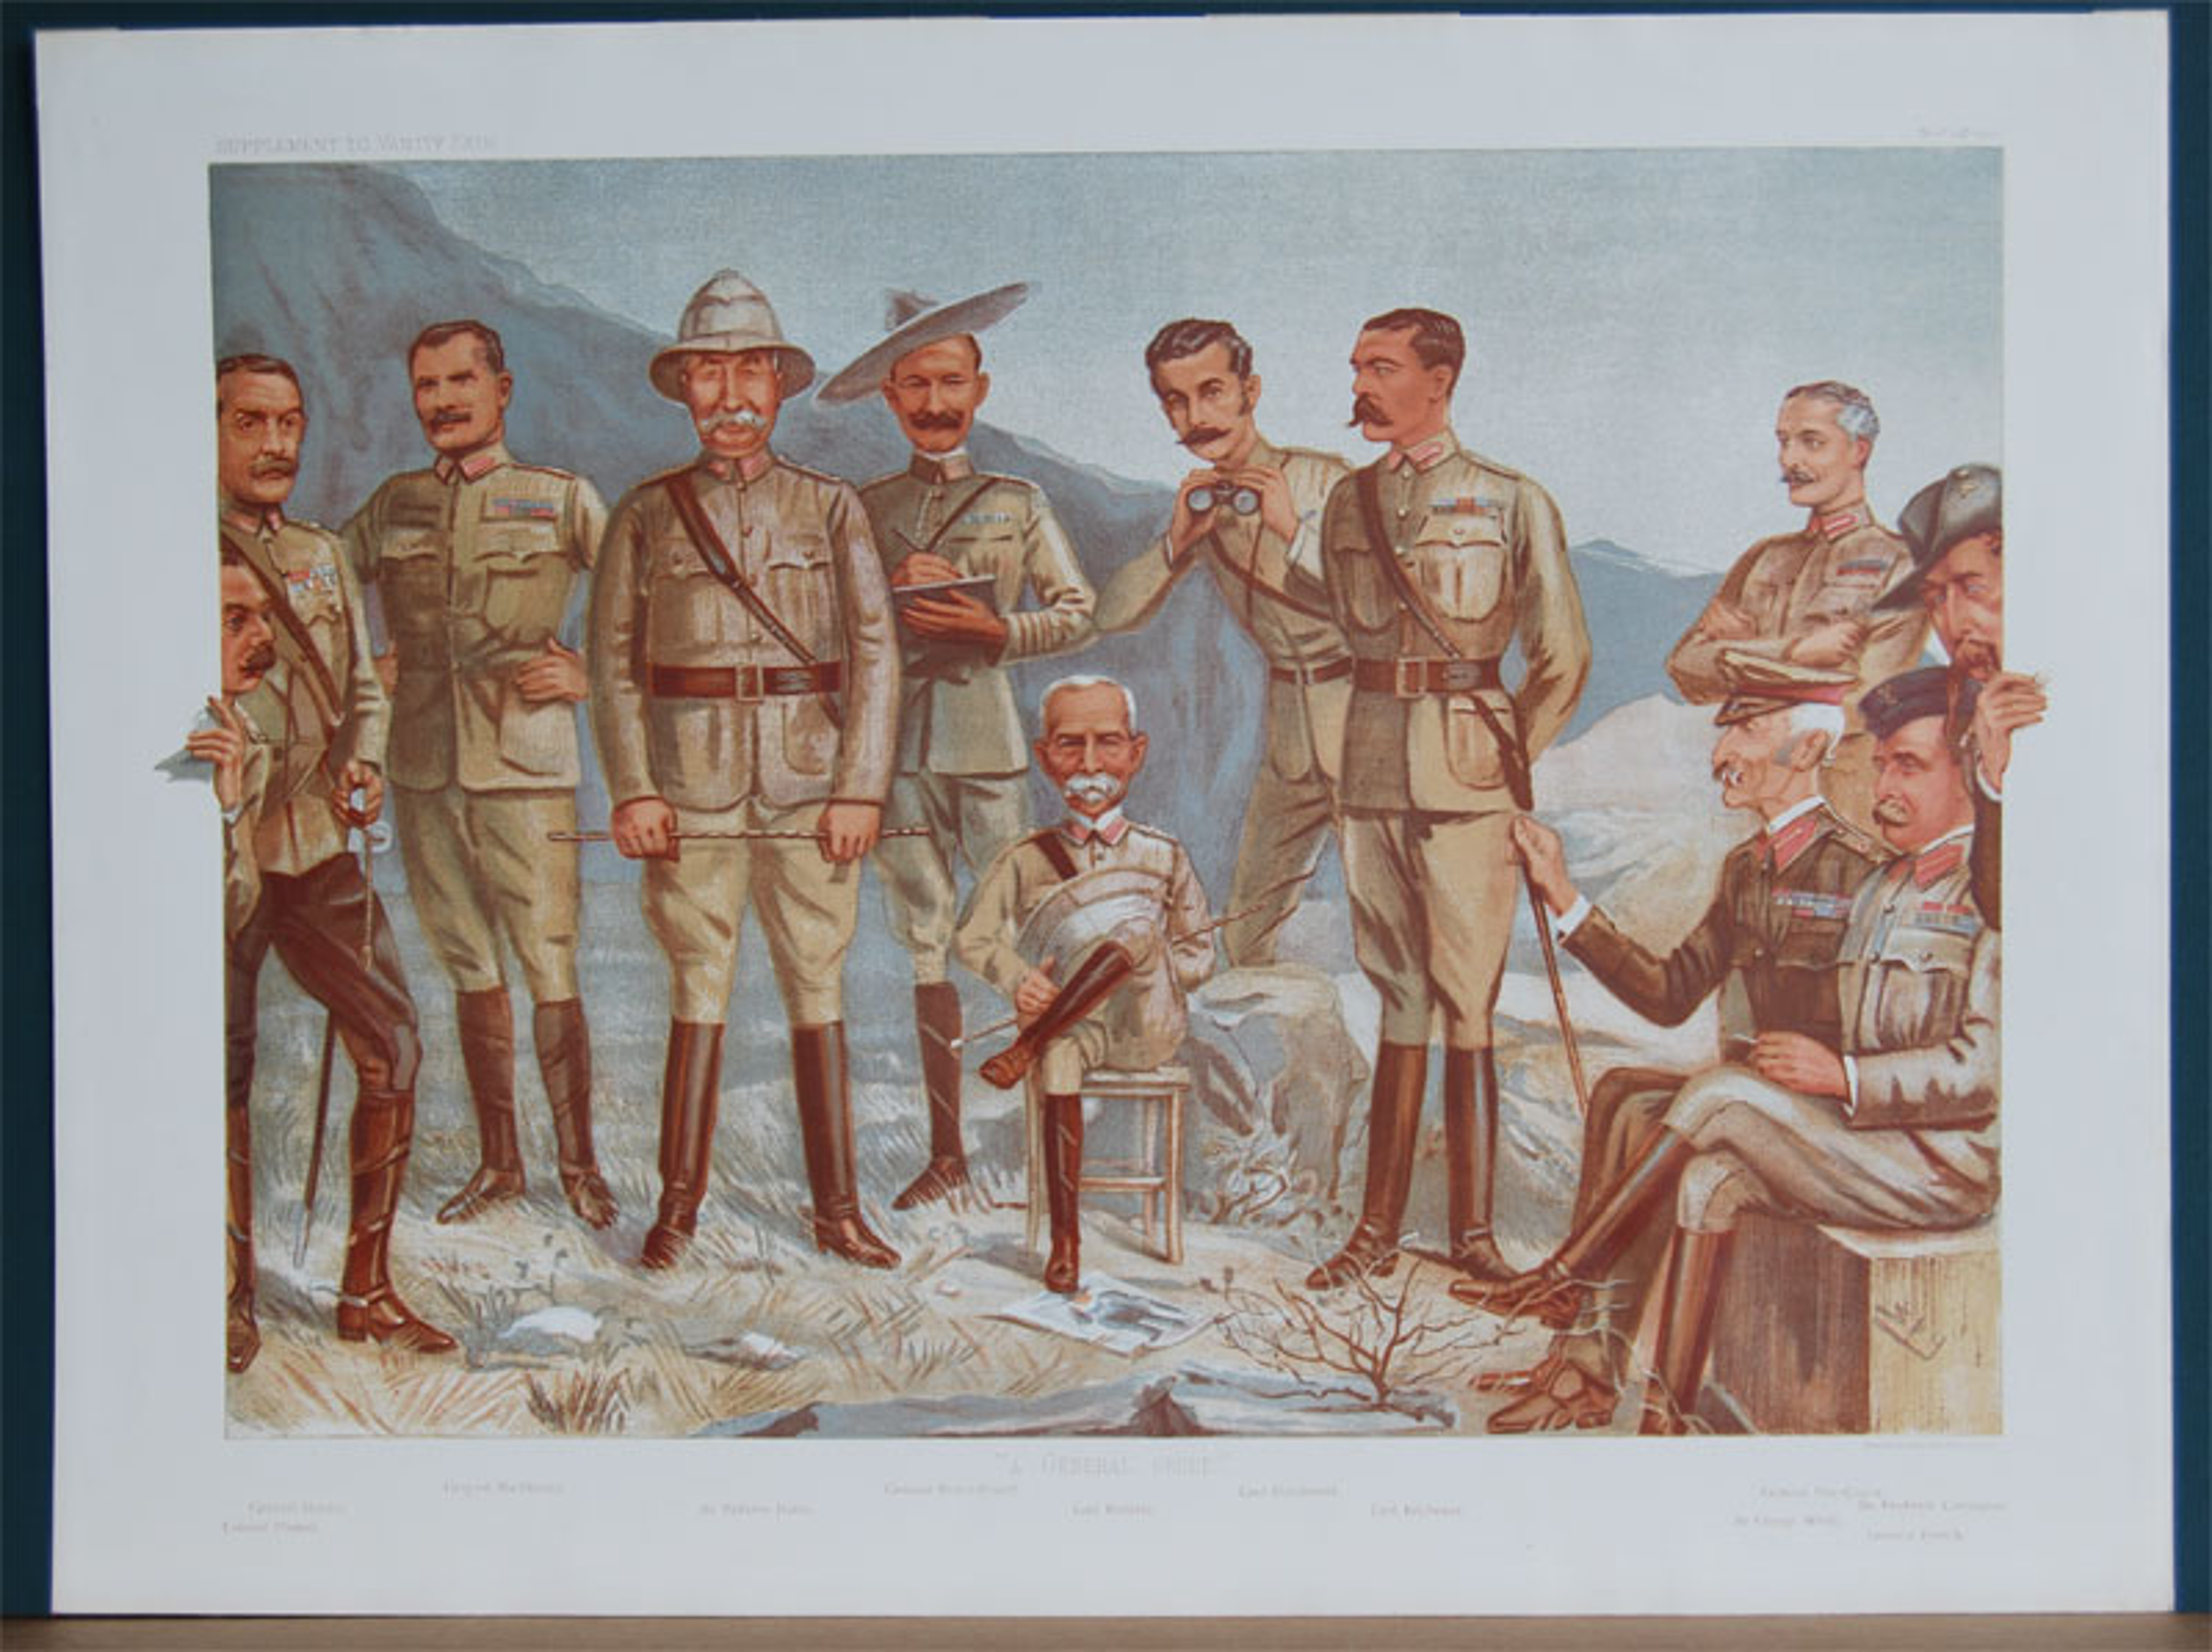 File:Lord Roberts and his commanders Vanity Fair 29 November 1900.jpg